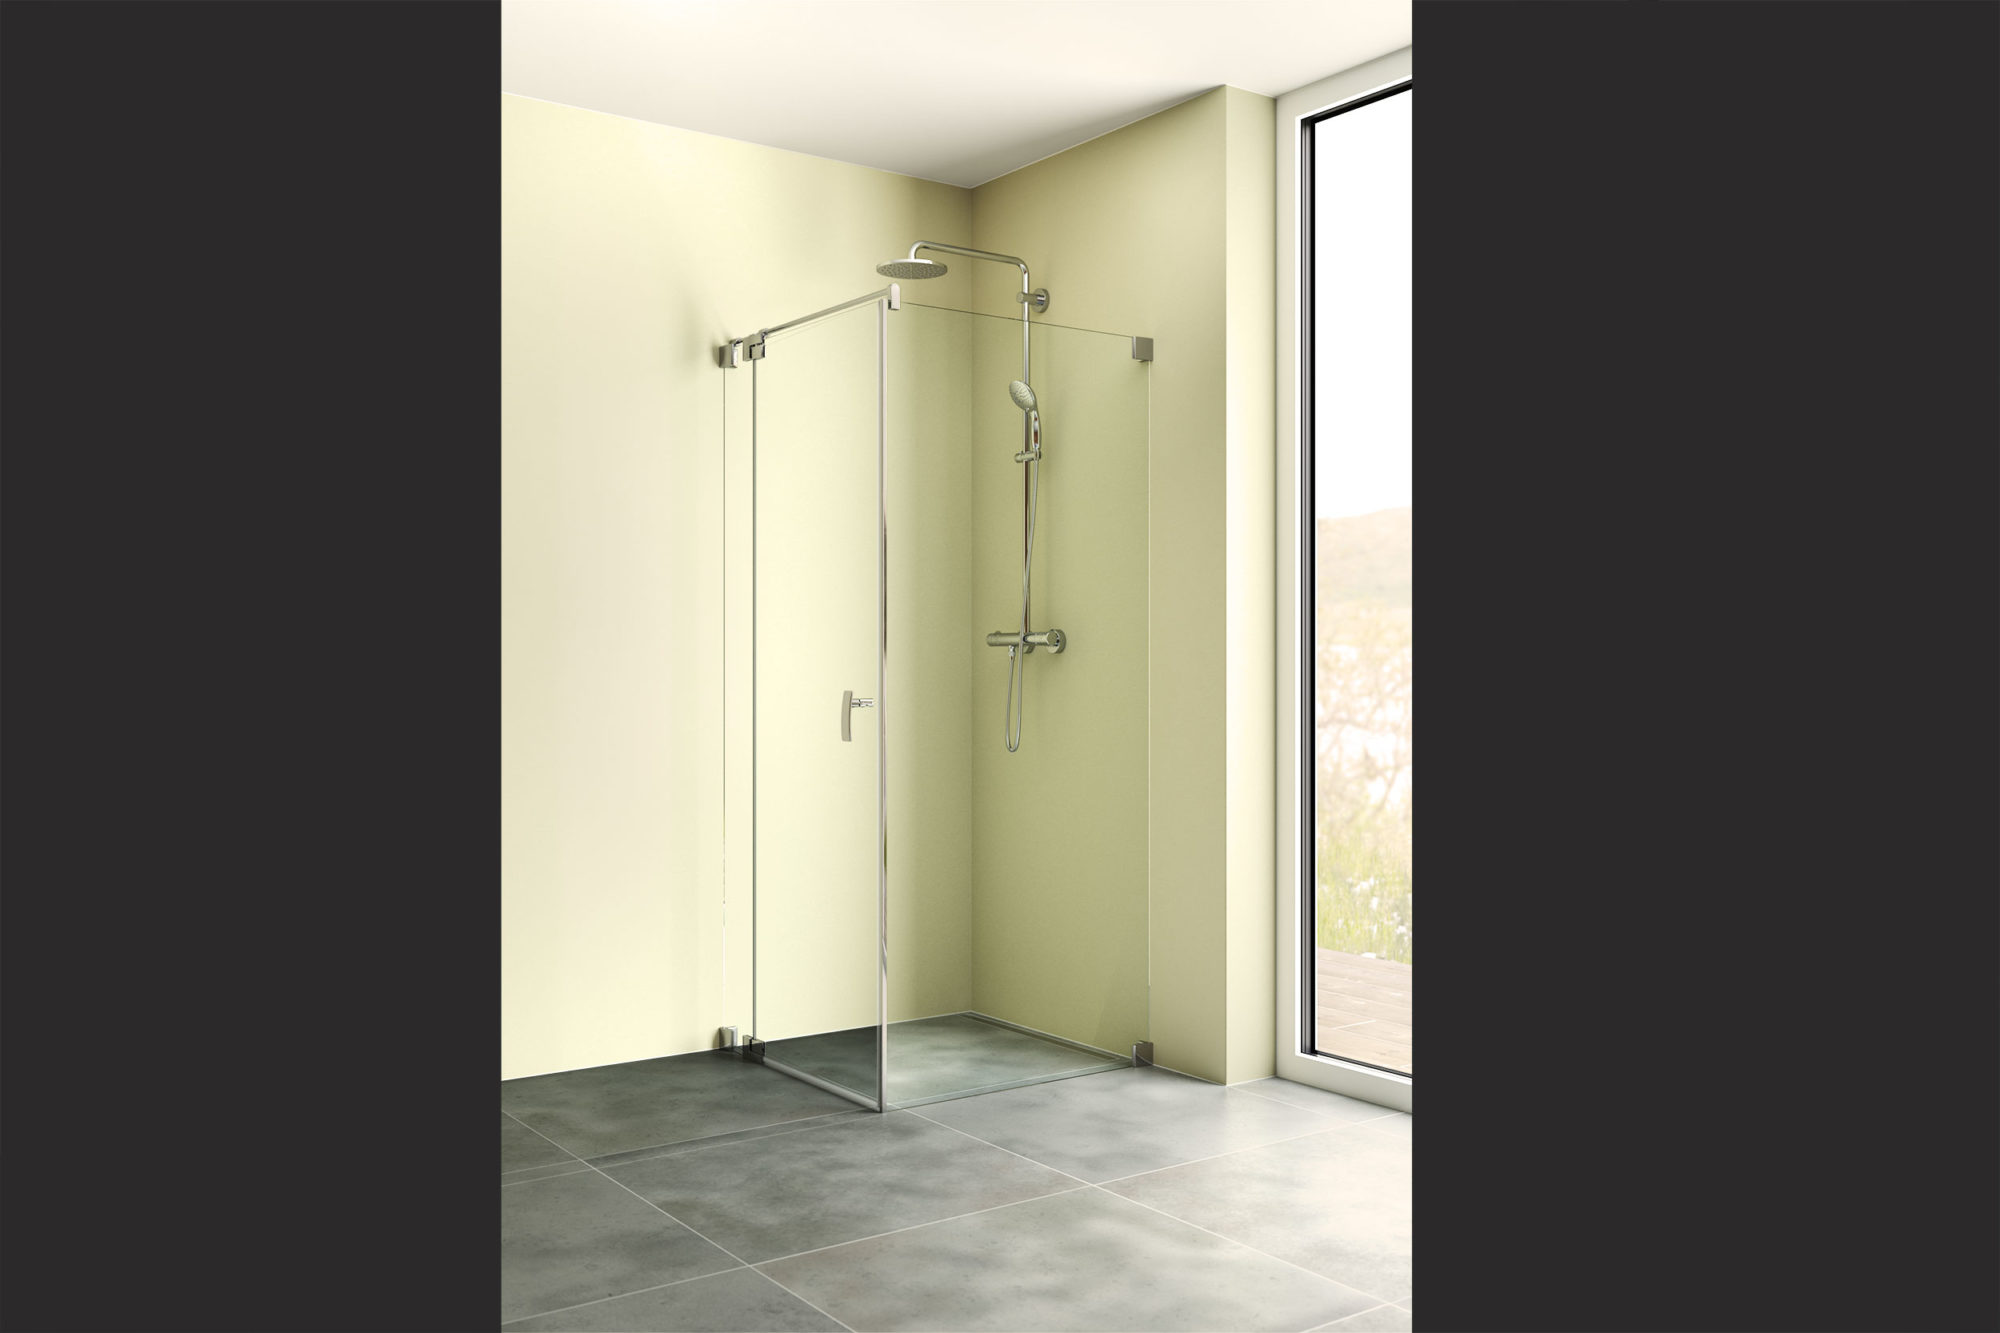 3D Rendering Dusche Wand grün Fenster Schlafen Eder Stefan